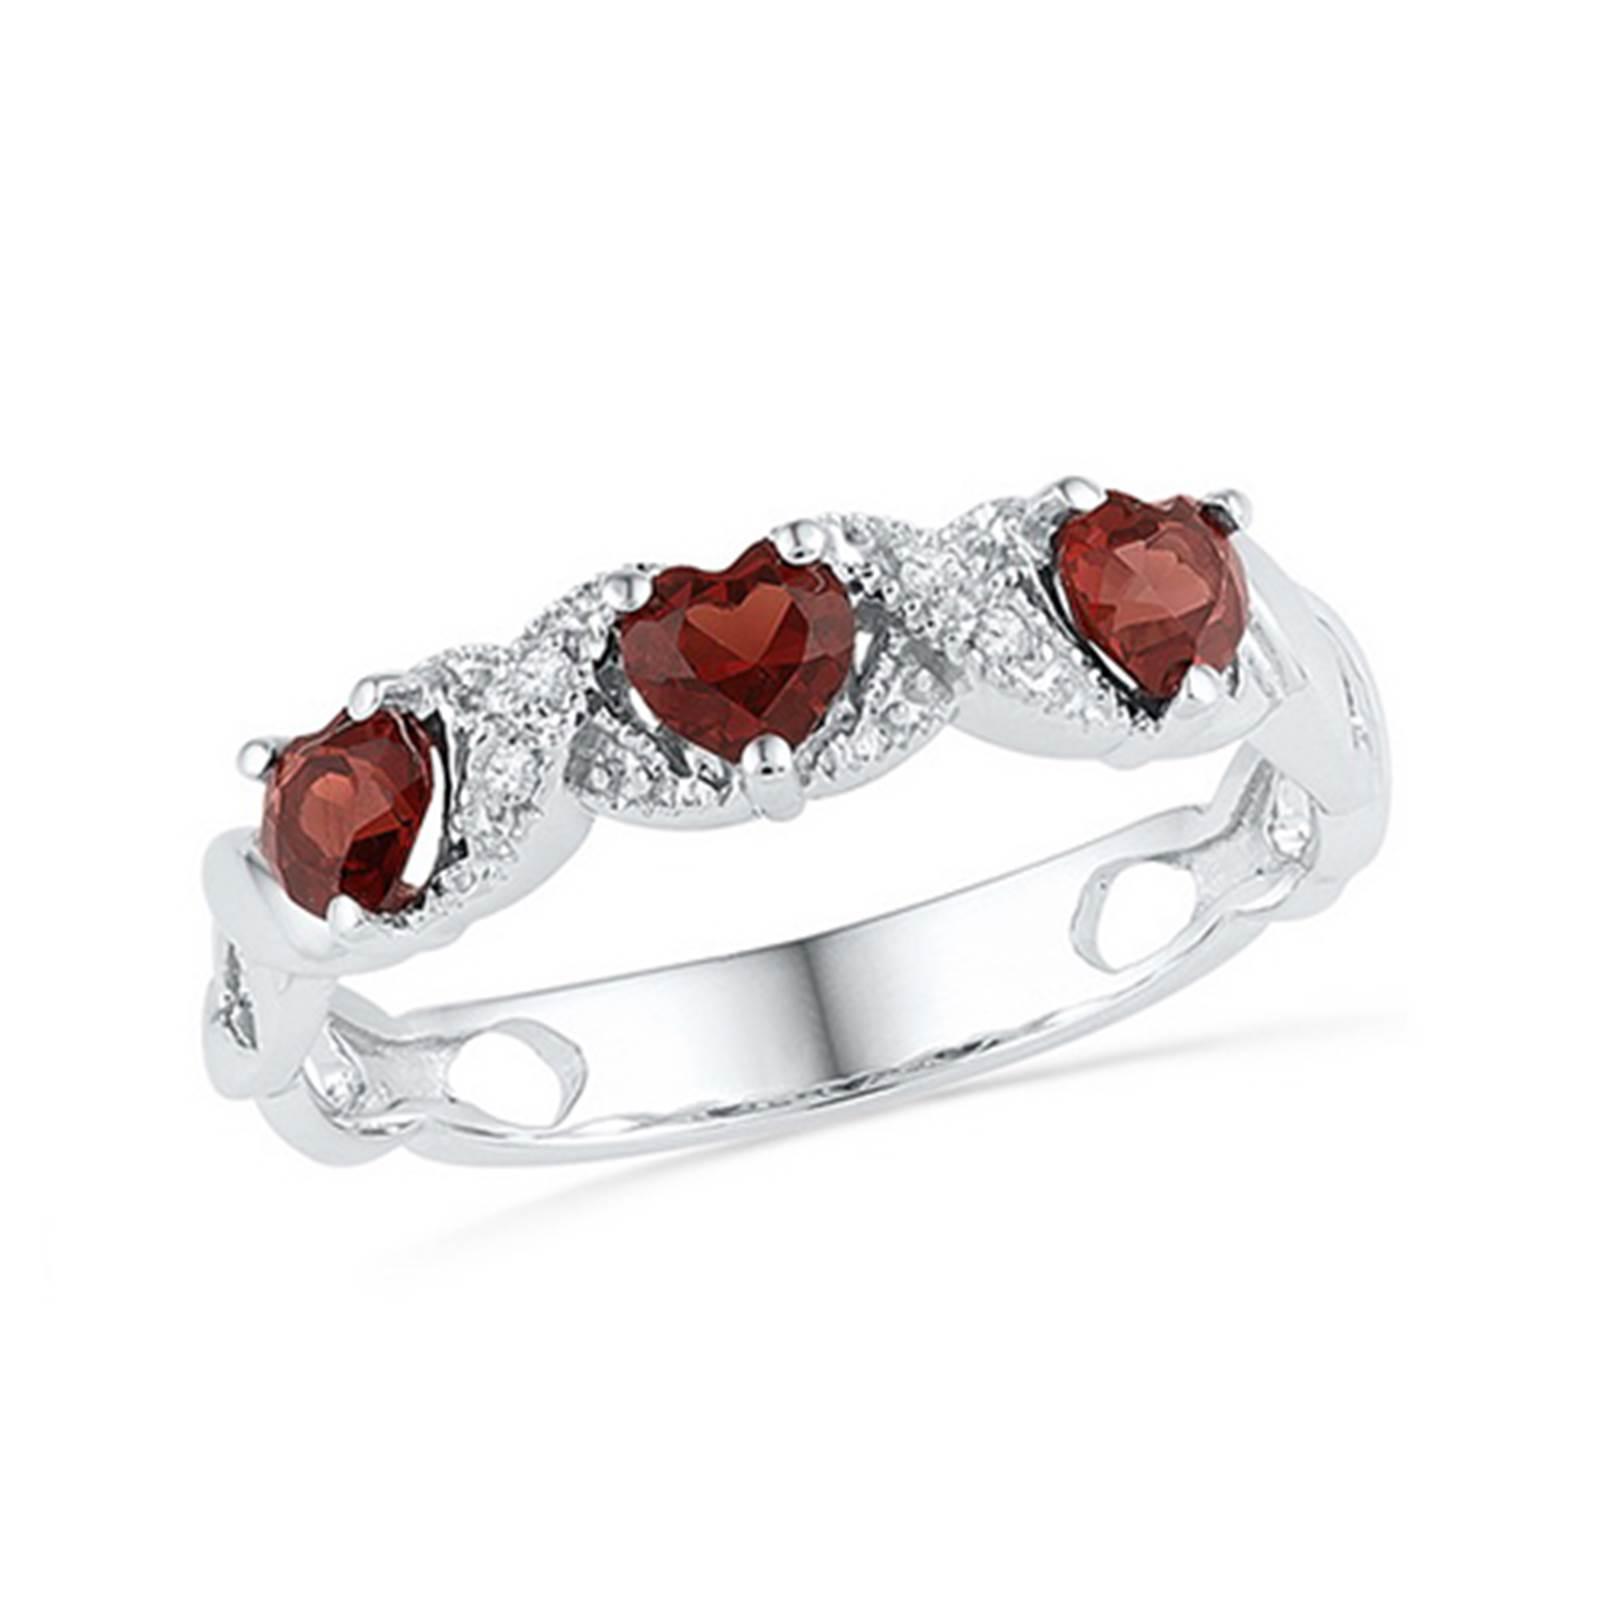 10k Ladies White Gold Diamond & Three Heart Cut Garnet Fashion Ring 0.81CT